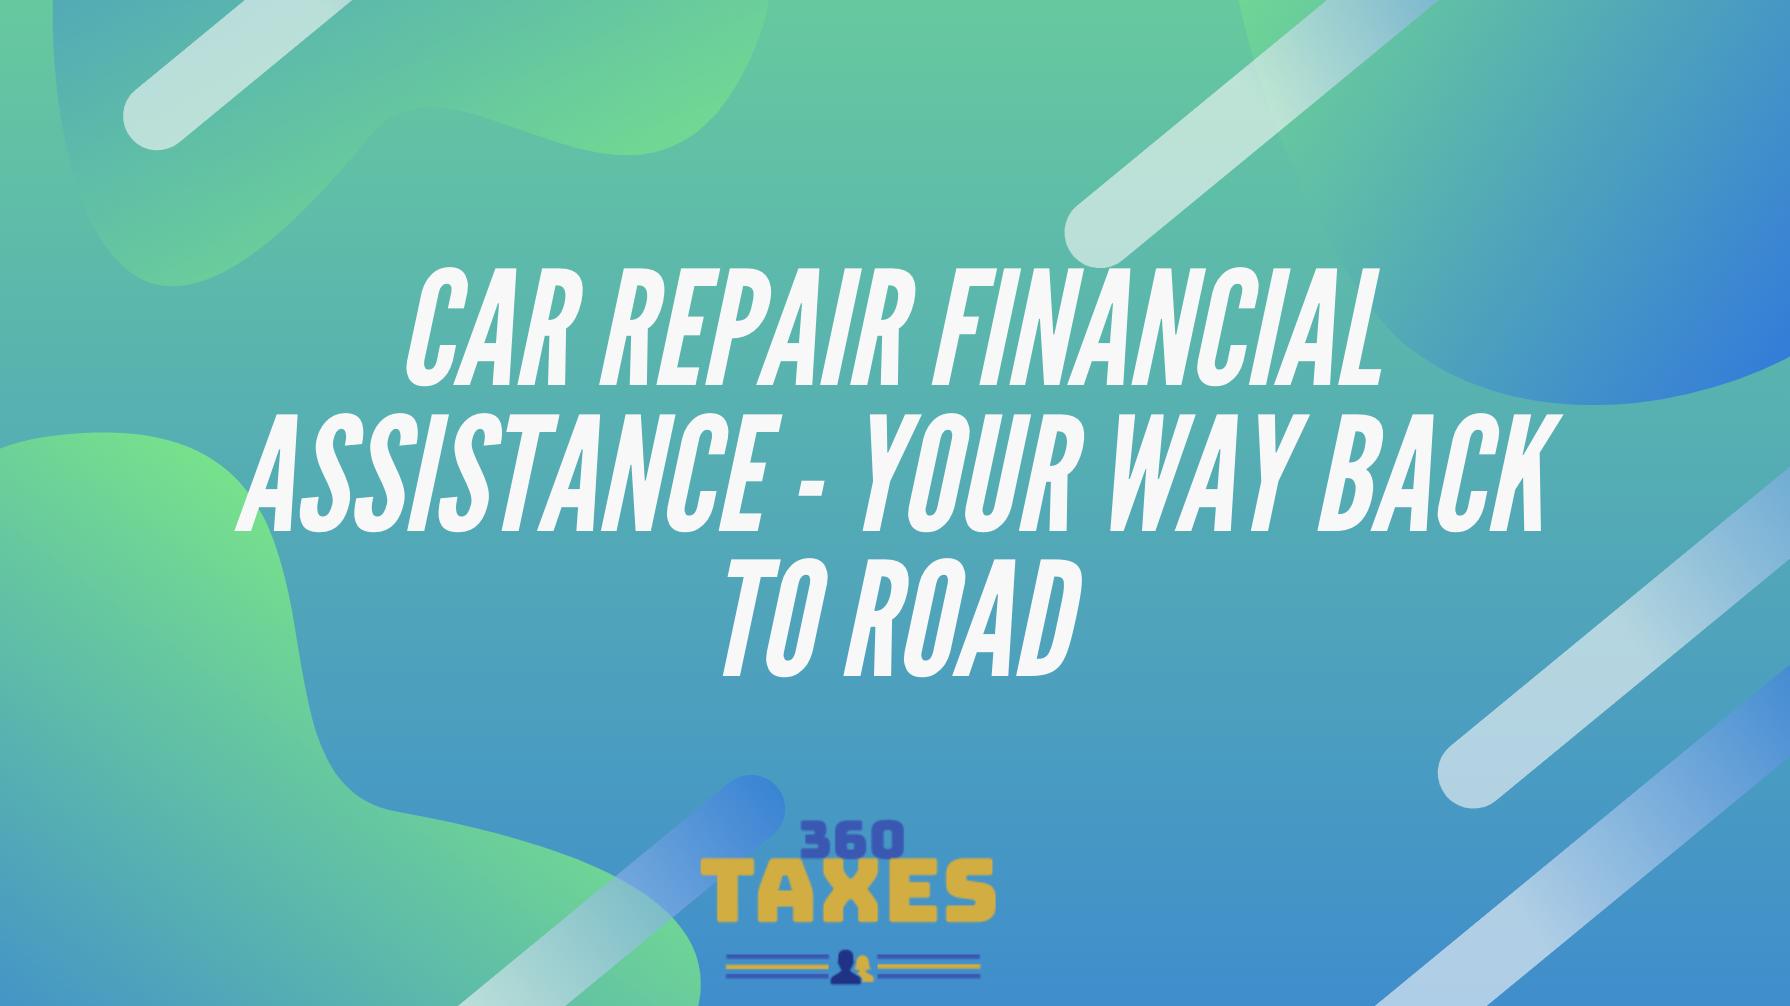 Car Repair Financial Assistance